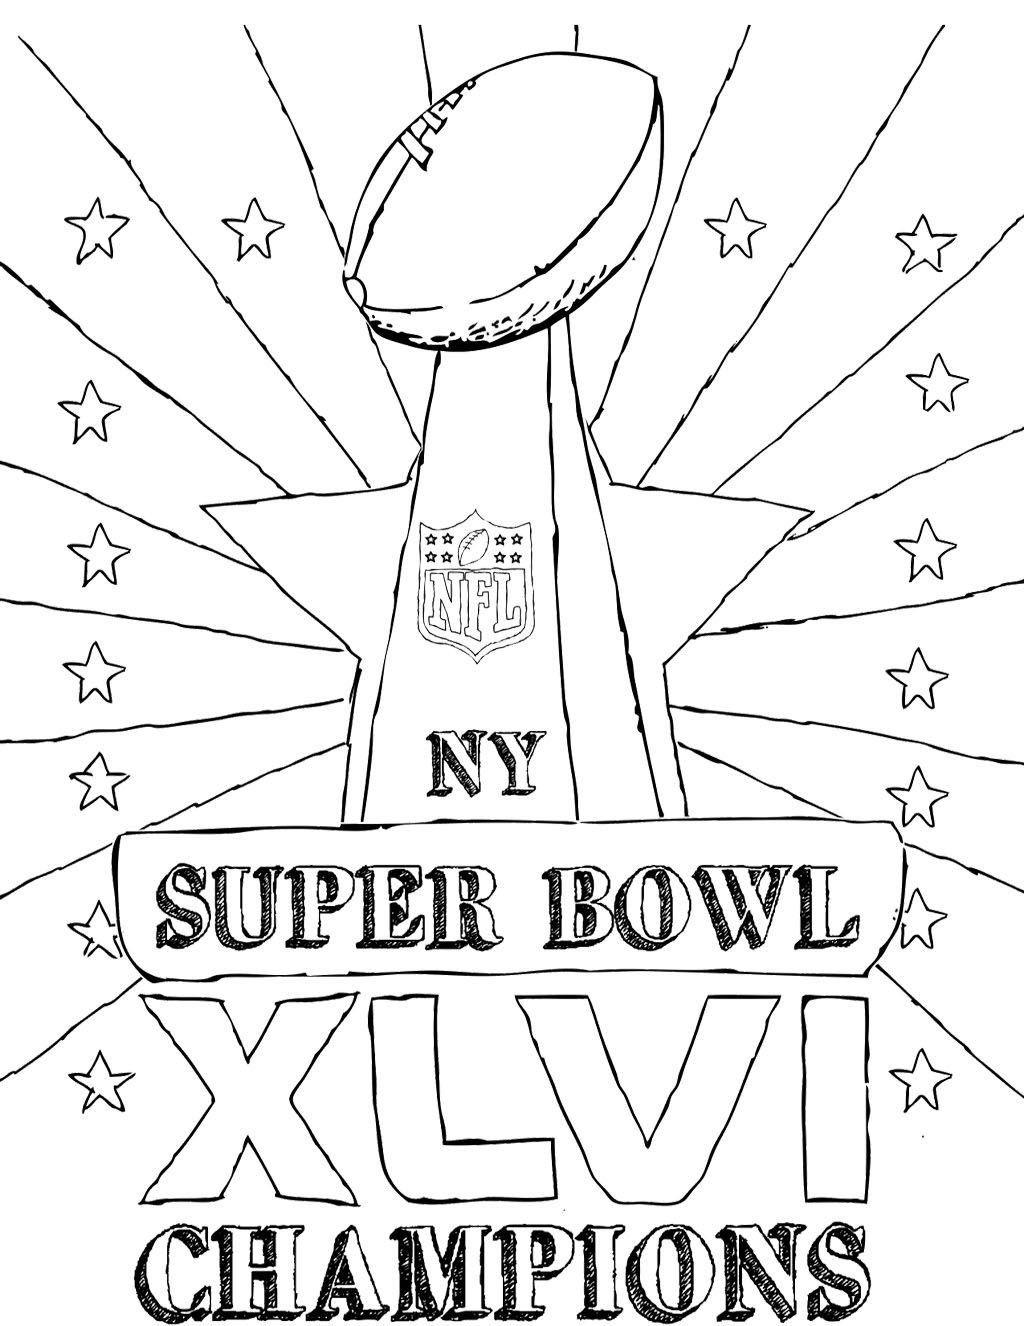 Super Bowl 50 Coloring Page Super Bowl Champions Coloring Page In 2020 Super Bowl Super Bowl 50 Super Bowl Trophy